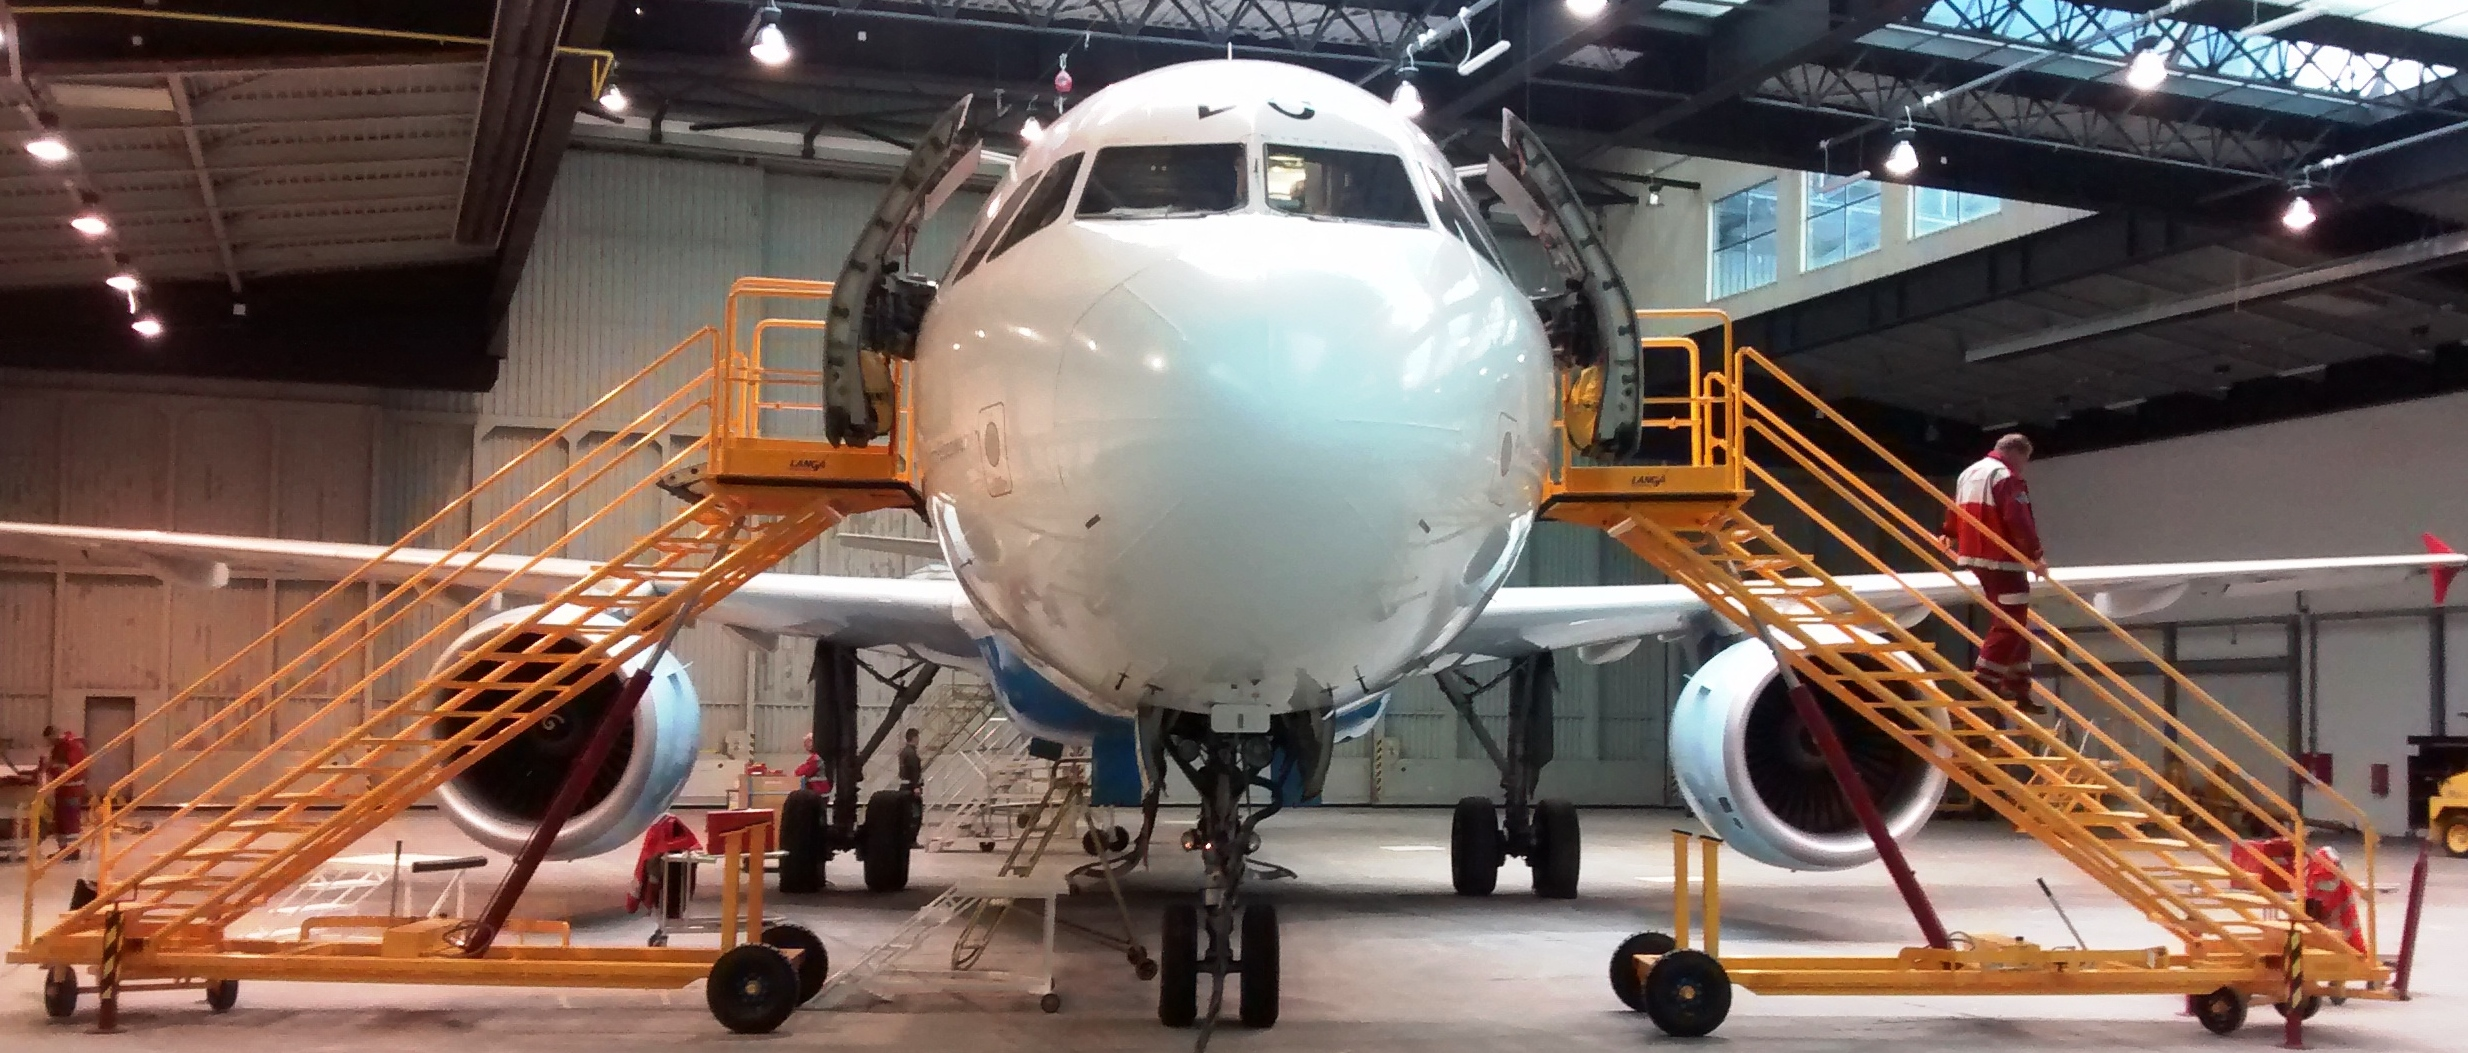 aircraft mro industry